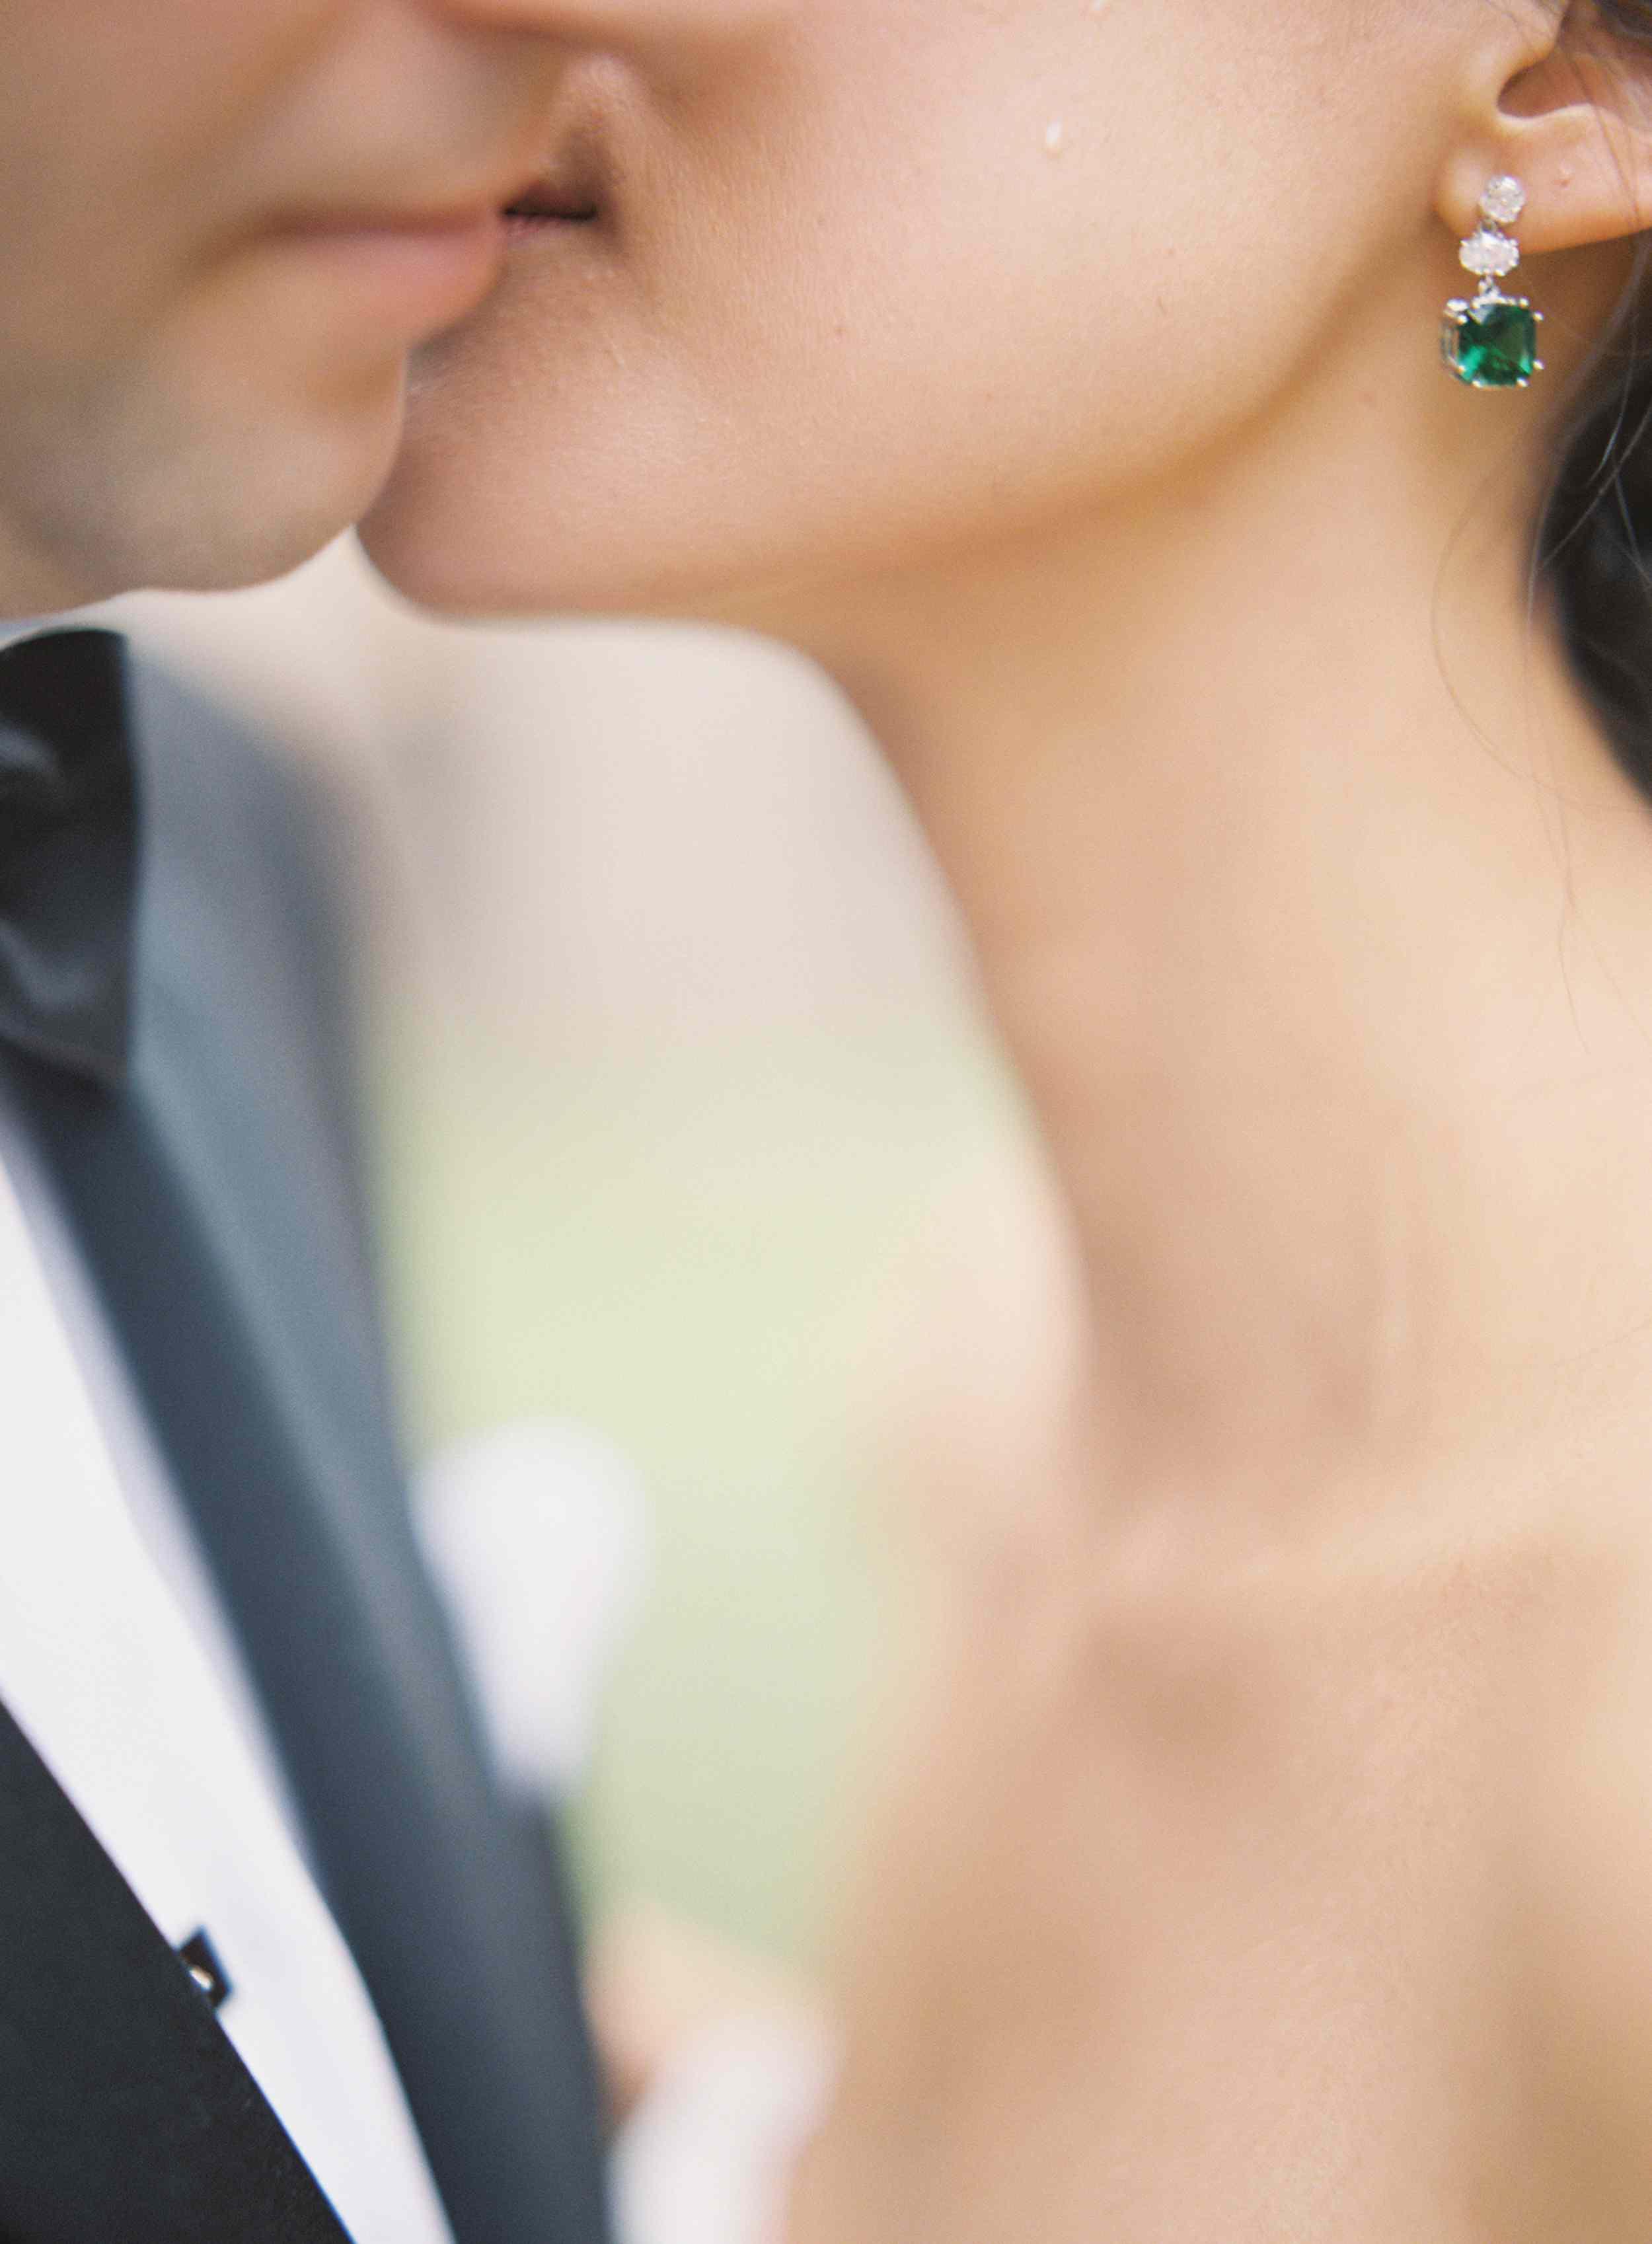 classic la badia italian wedding, bride's emerald earrings